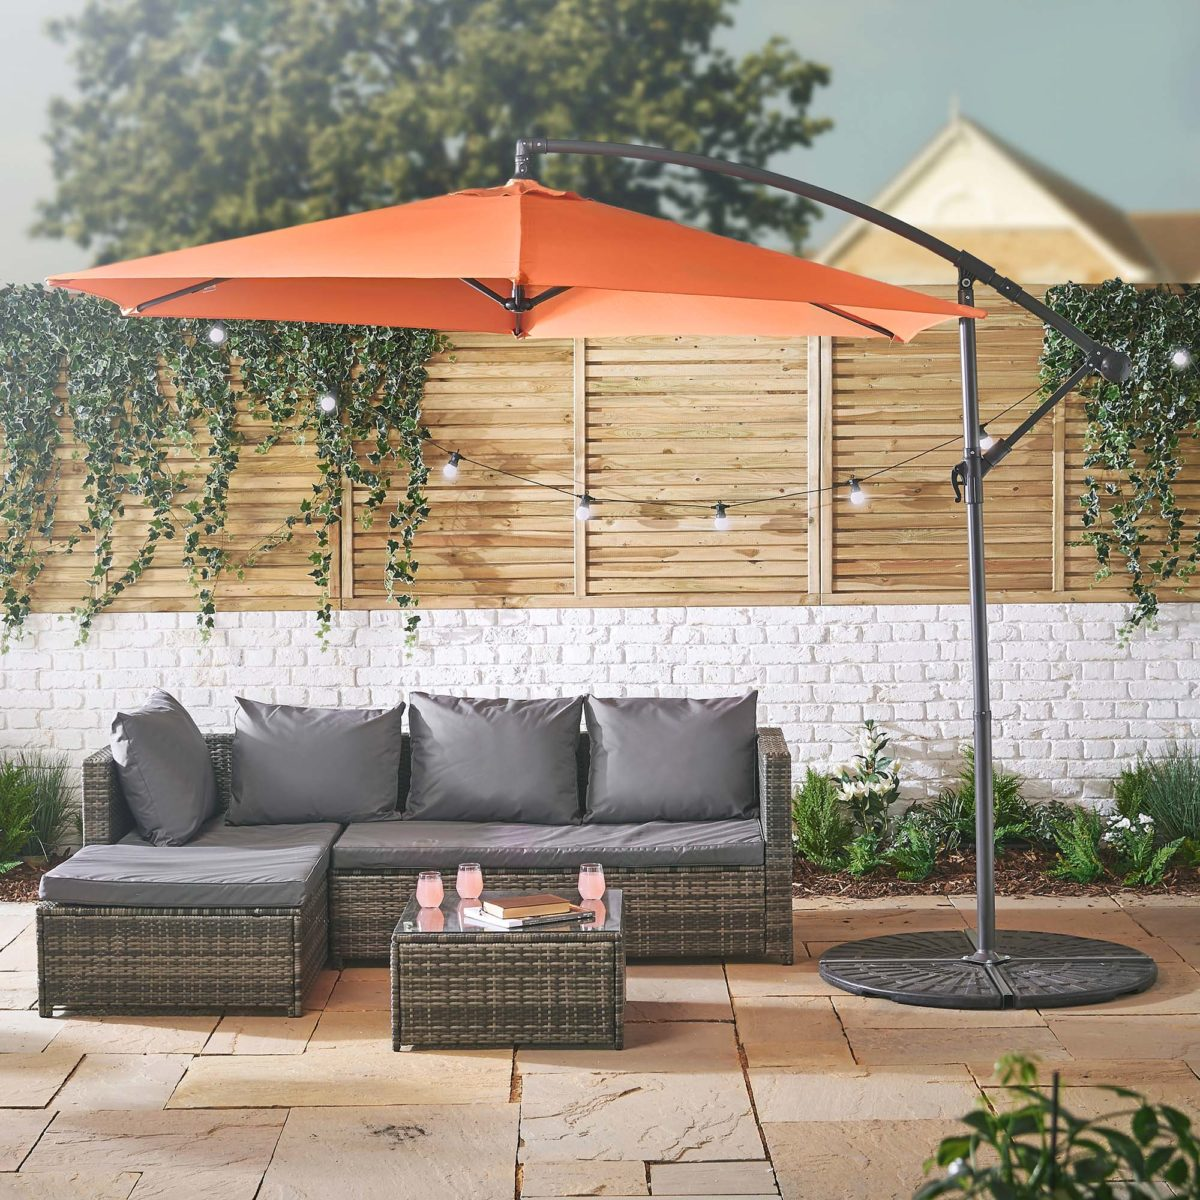 8domu-brands_vonhaus-3m-banana-umbrella-parasol-tawny-orange--1200x1200.jpg